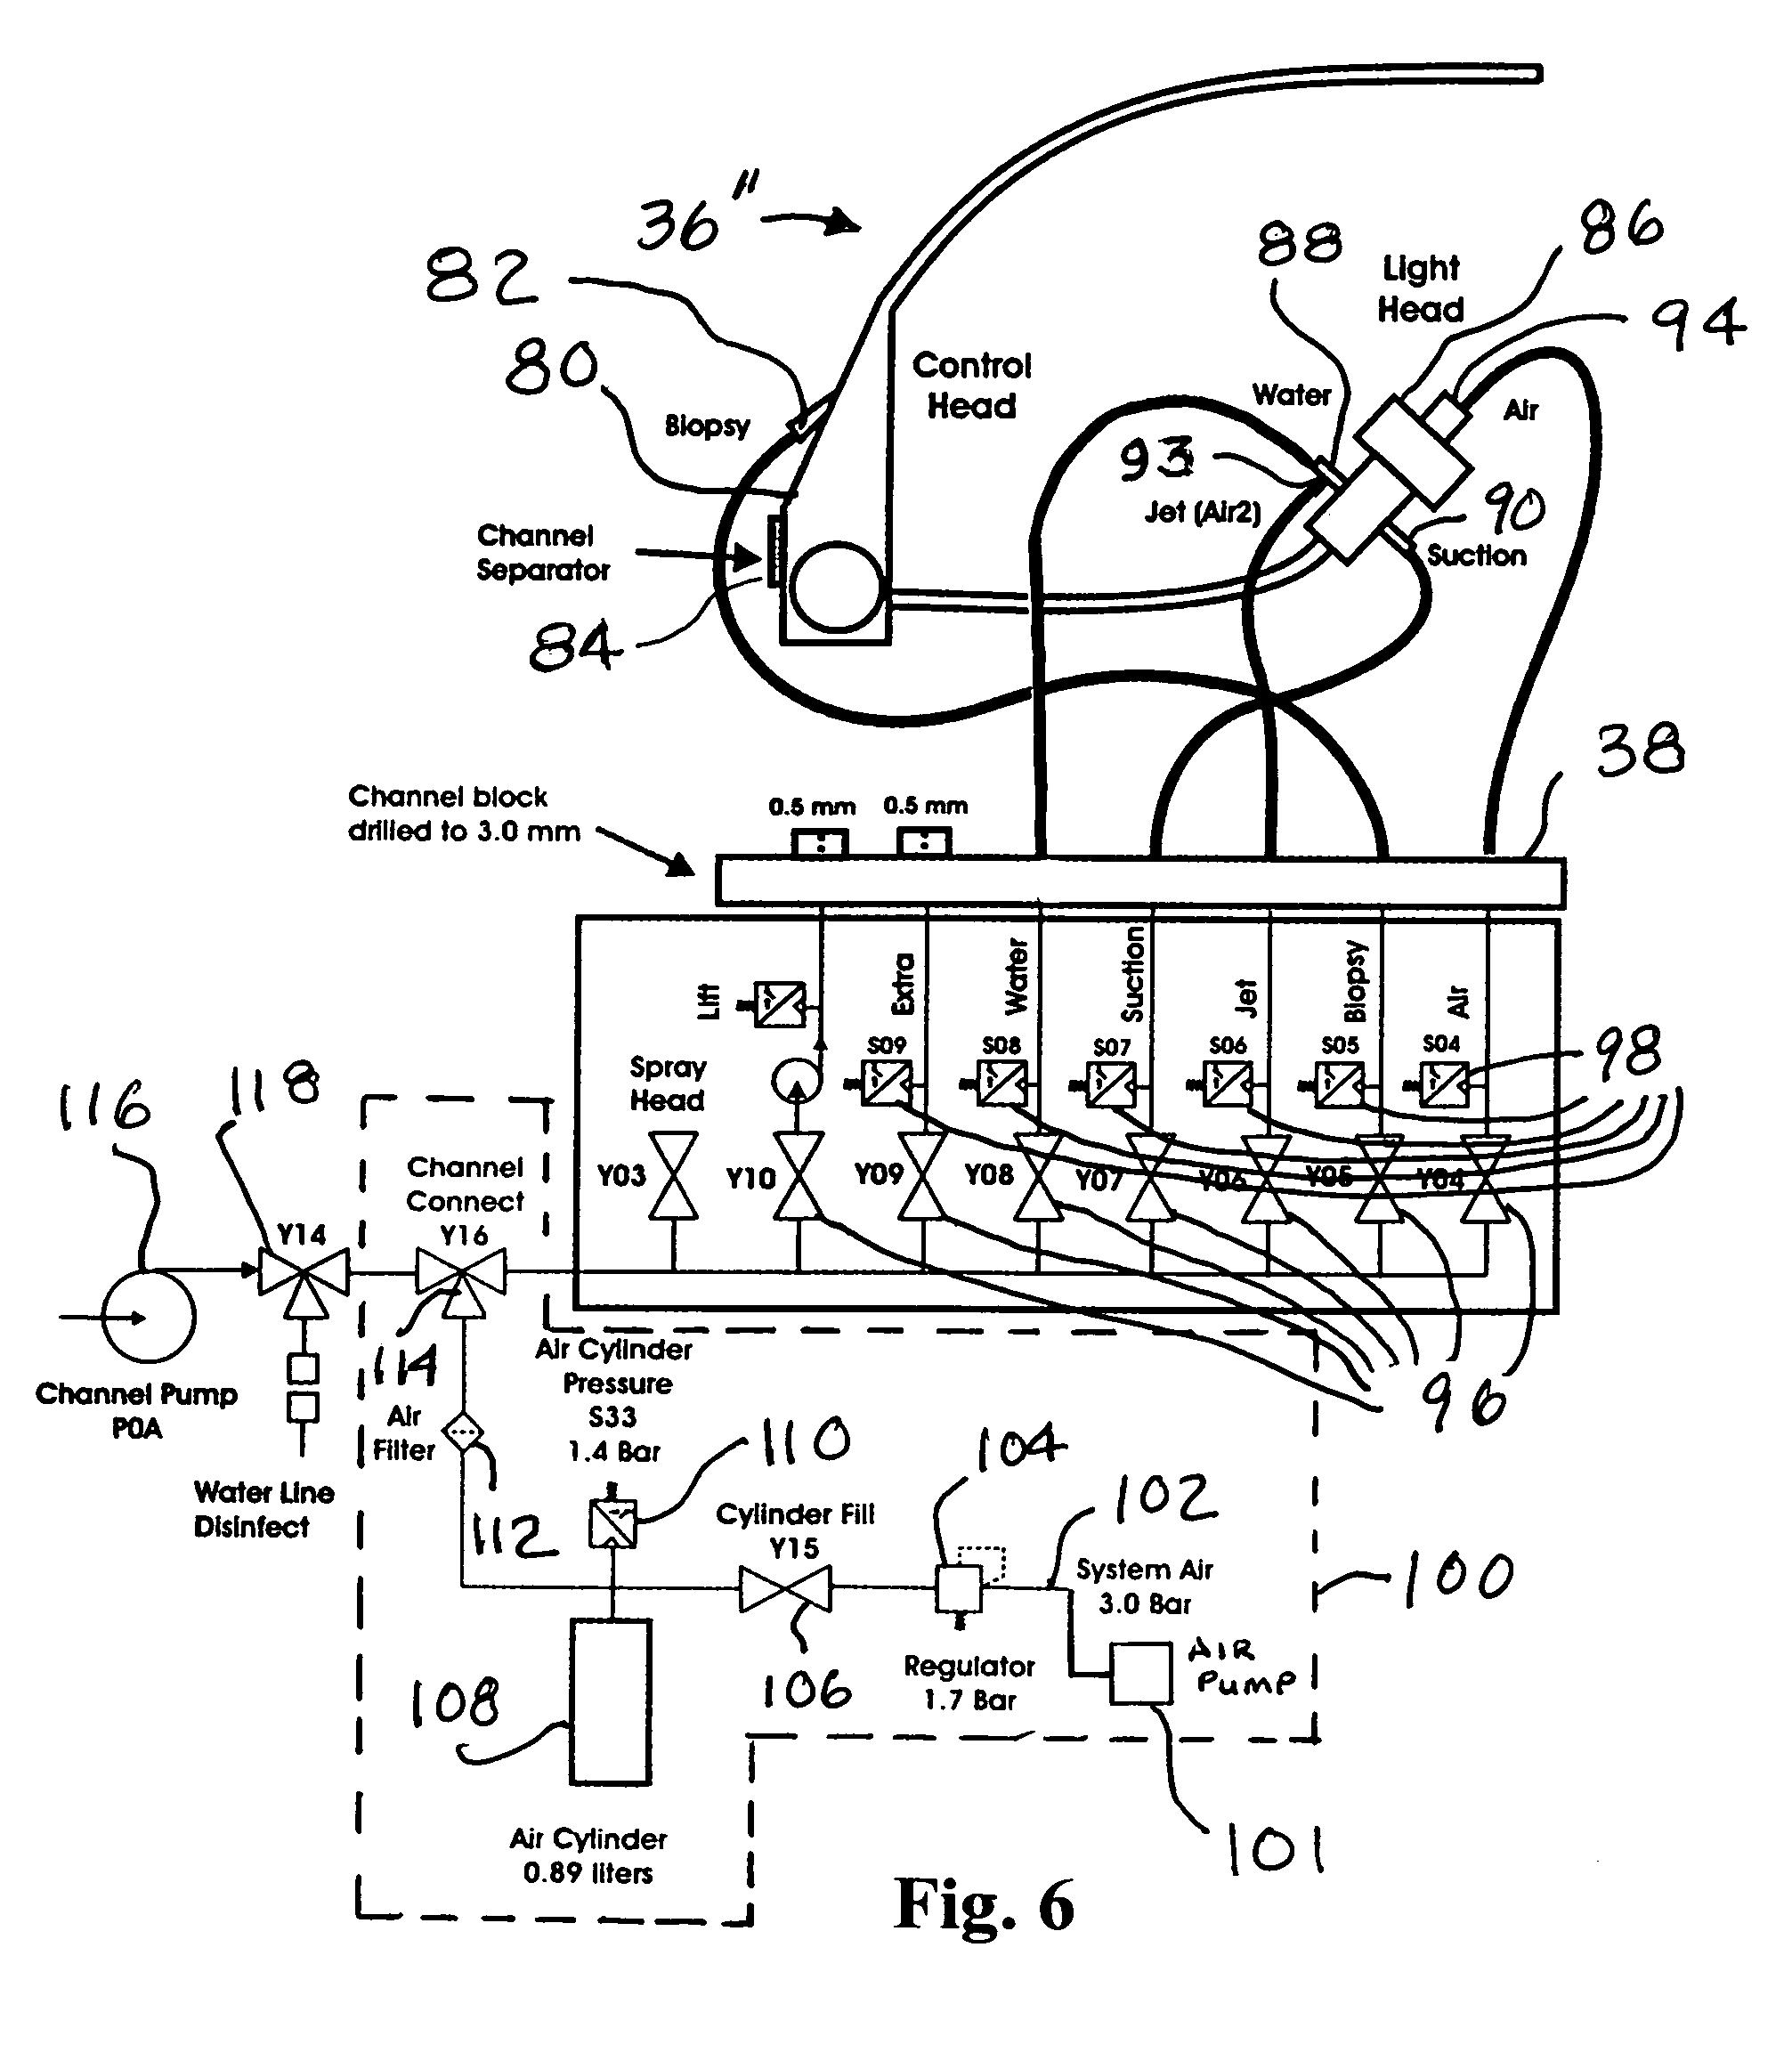 patent us7901349 endoscope reprocessor connectivity apparatus